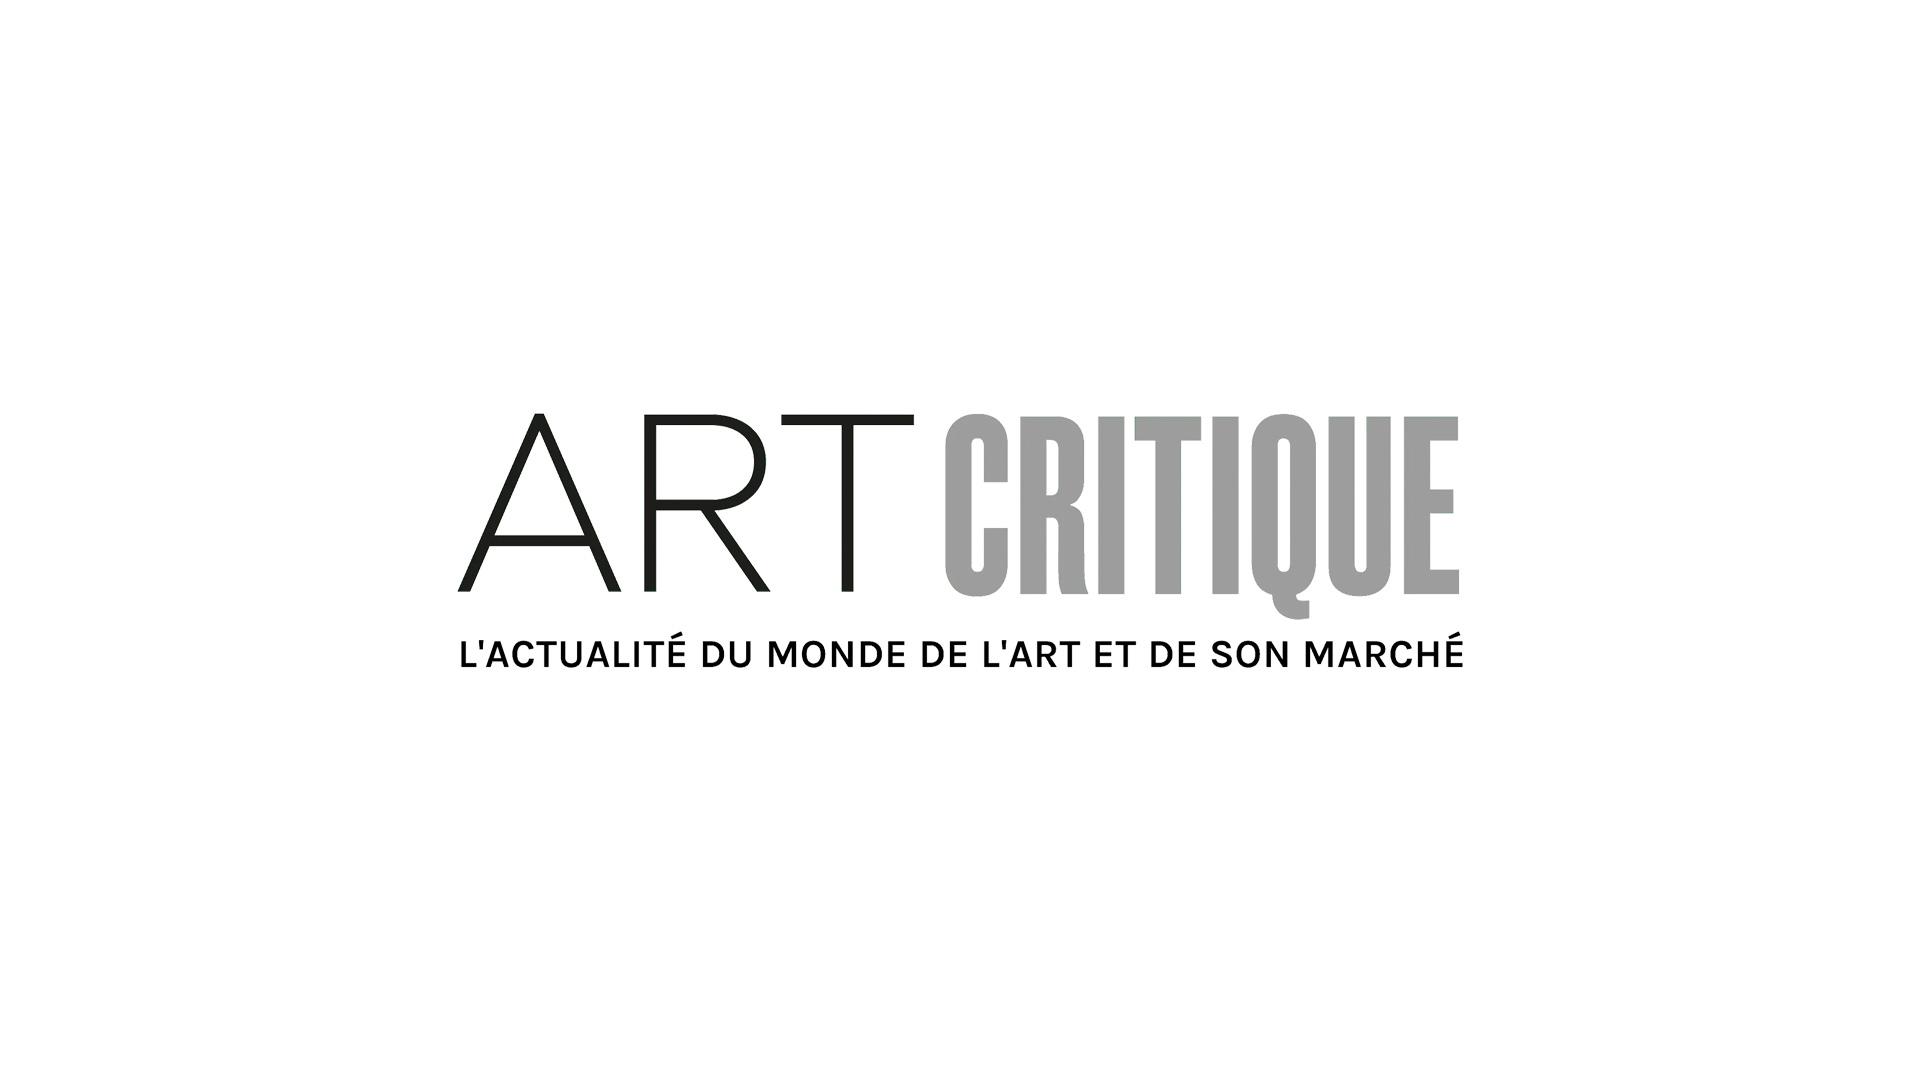 Russian billionaire Dmitry Rybolovlev launches $380 million USD lawsuit against Sotheby's